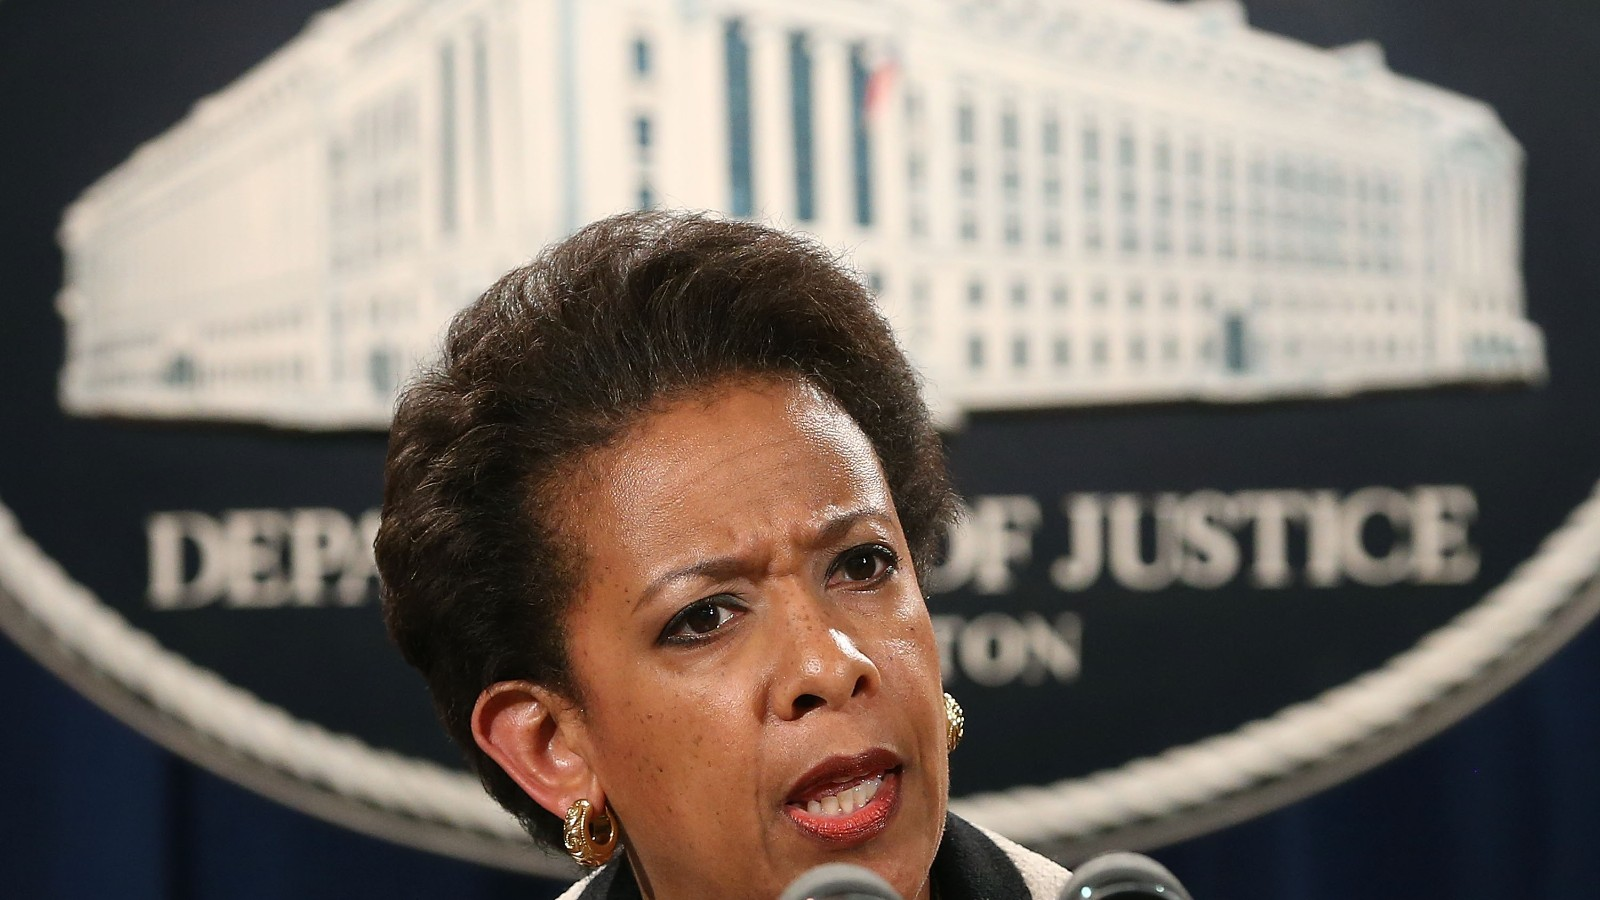 Politics And Justice >> Justice Dept. pledges to focus on Wall Street crime - CNNPolitics